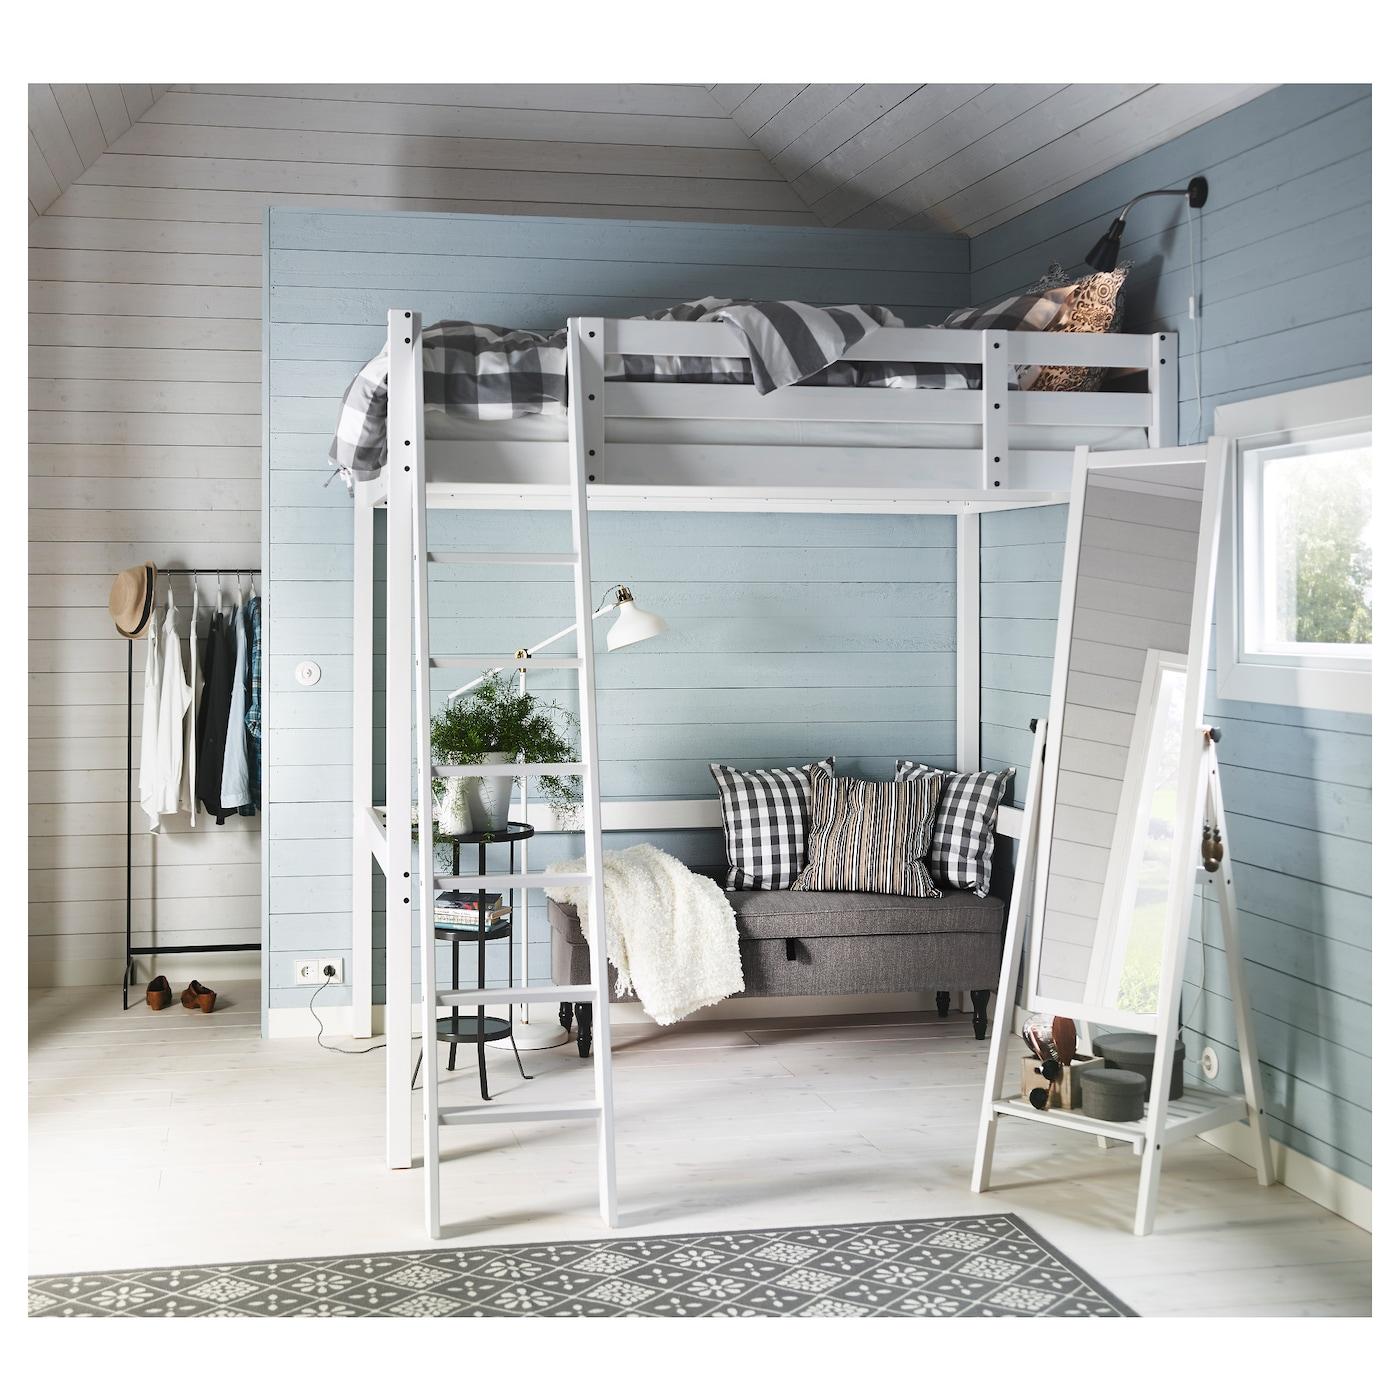 Alinea Meuble Type Loft - Stor Loft Bed Frame White Stain 140×200 Cm Ikea[mjhdah]http://www.tiltpress.com/wp-content/uploads/2017/09/Ikea-Stora-Loft-Bed-Type.jpg